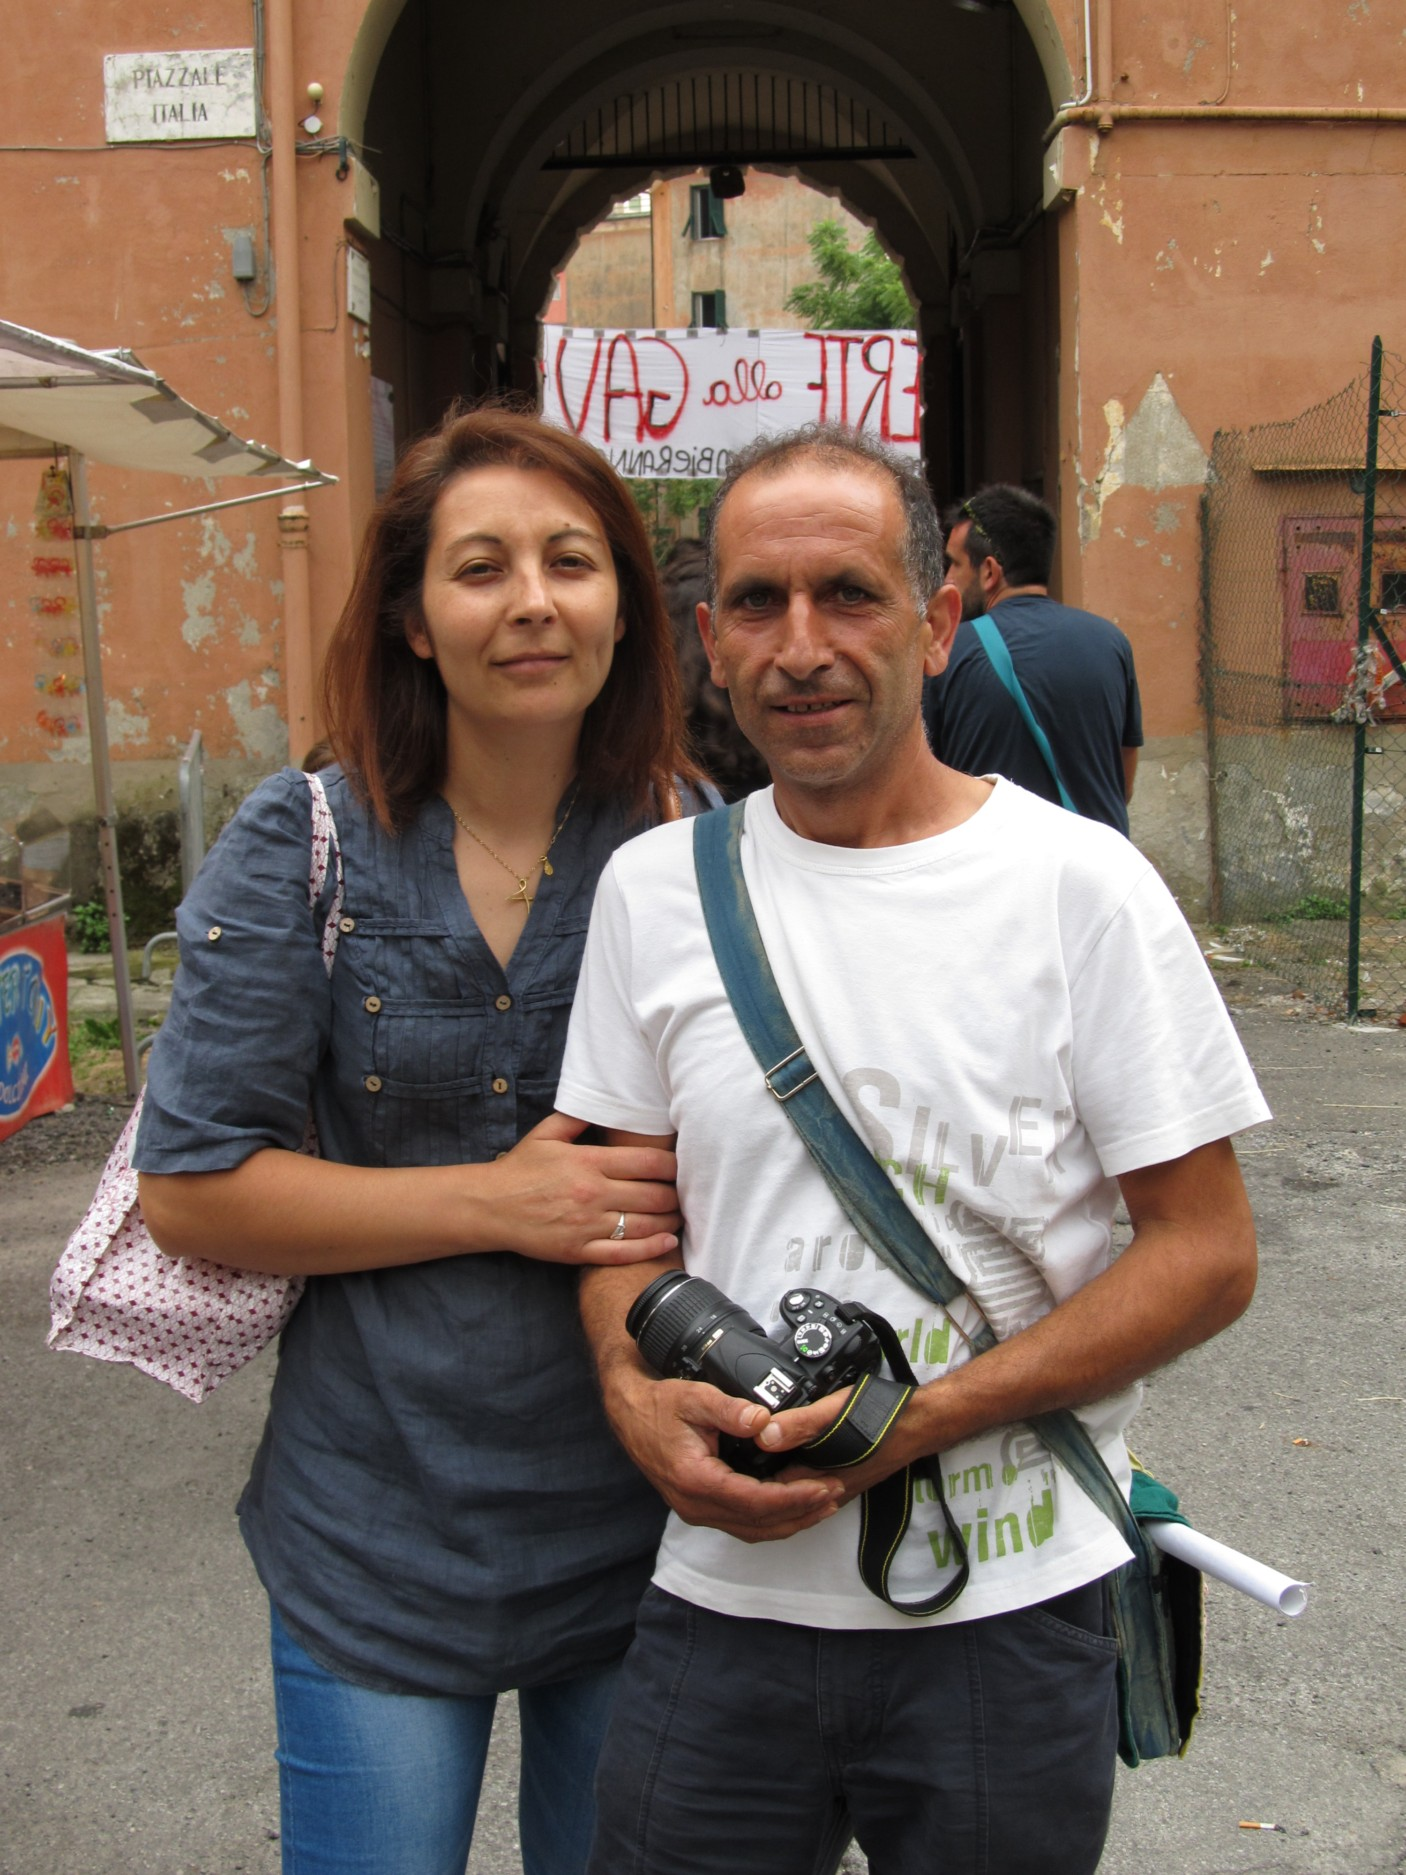 festa_gavoglio_2014-07-25-19-12-19